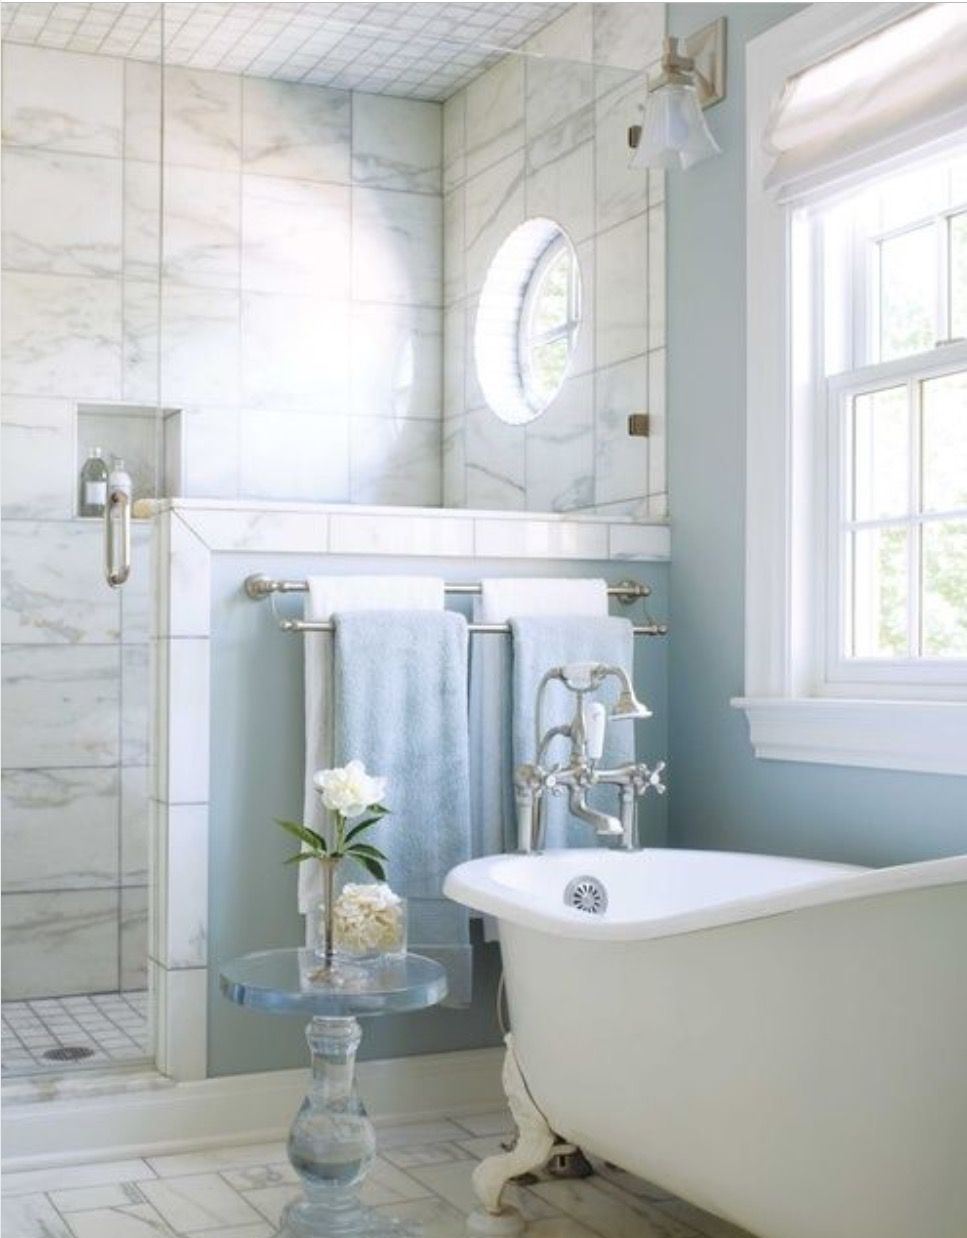 Pin by Beth Whitaker on Fabulous Bathroom Designs | Pinterest | Bath ...